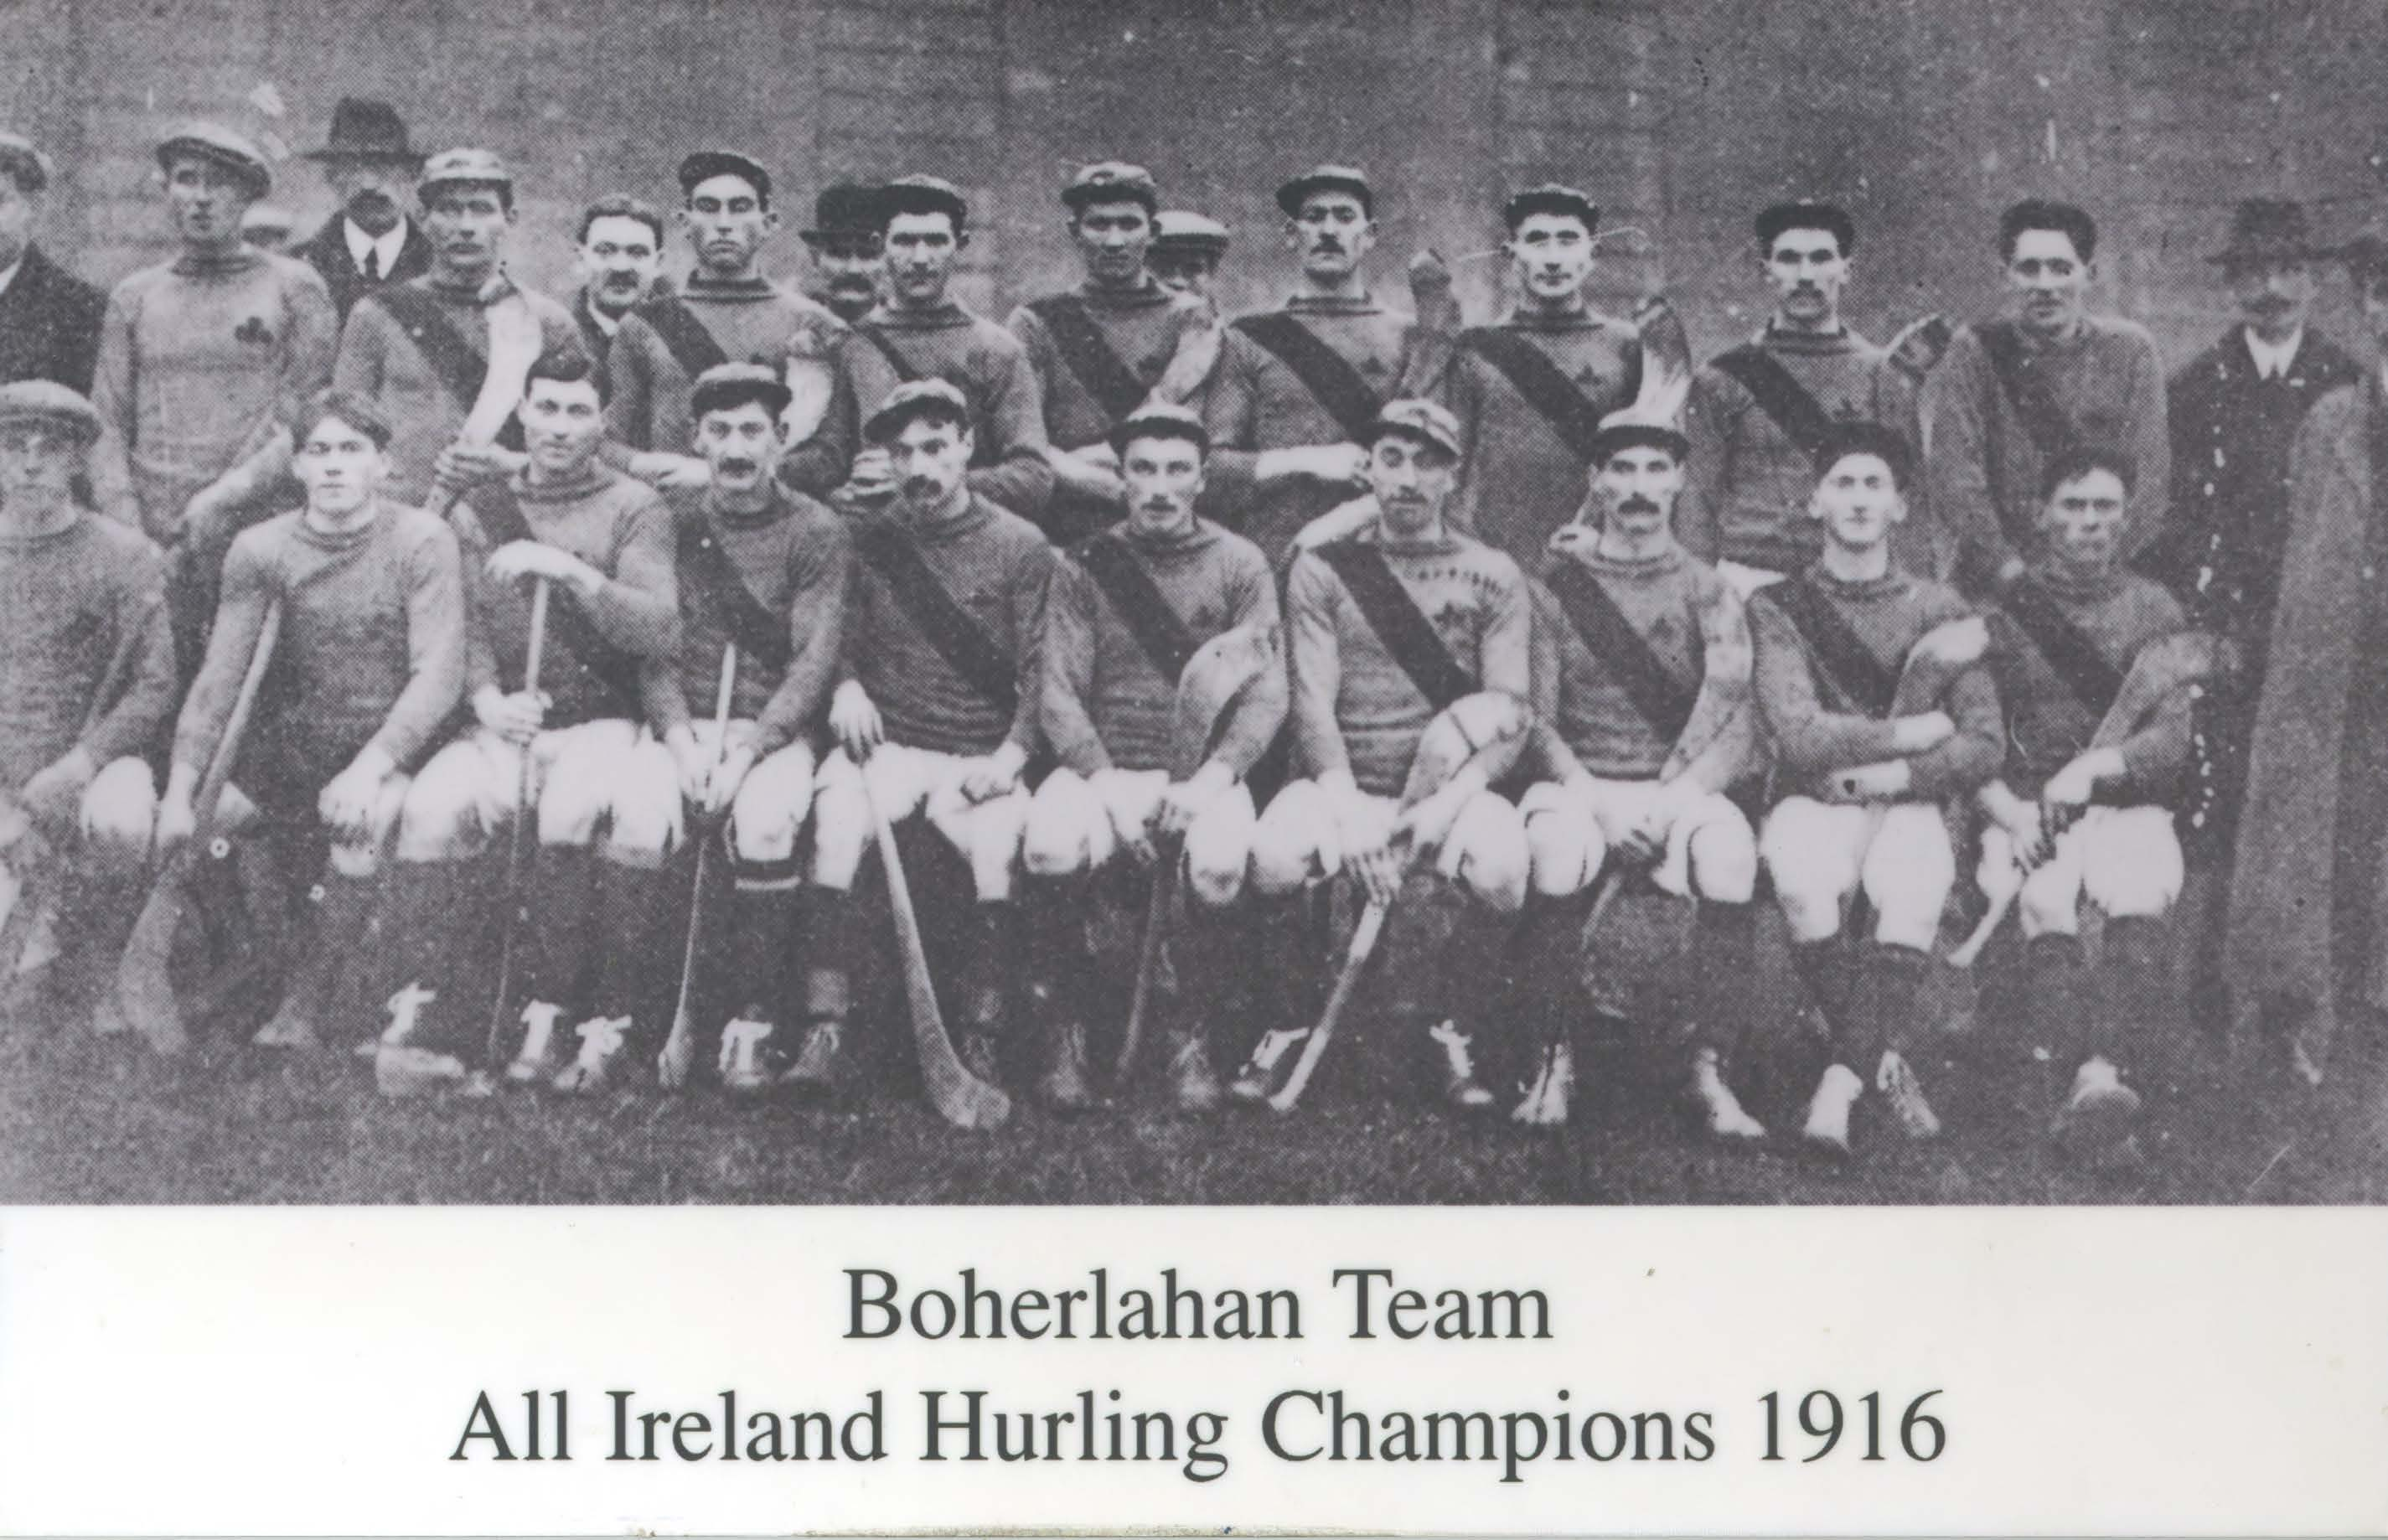 Tipperary (Boherlahan) 1916 Hurling All-Ireland Champions